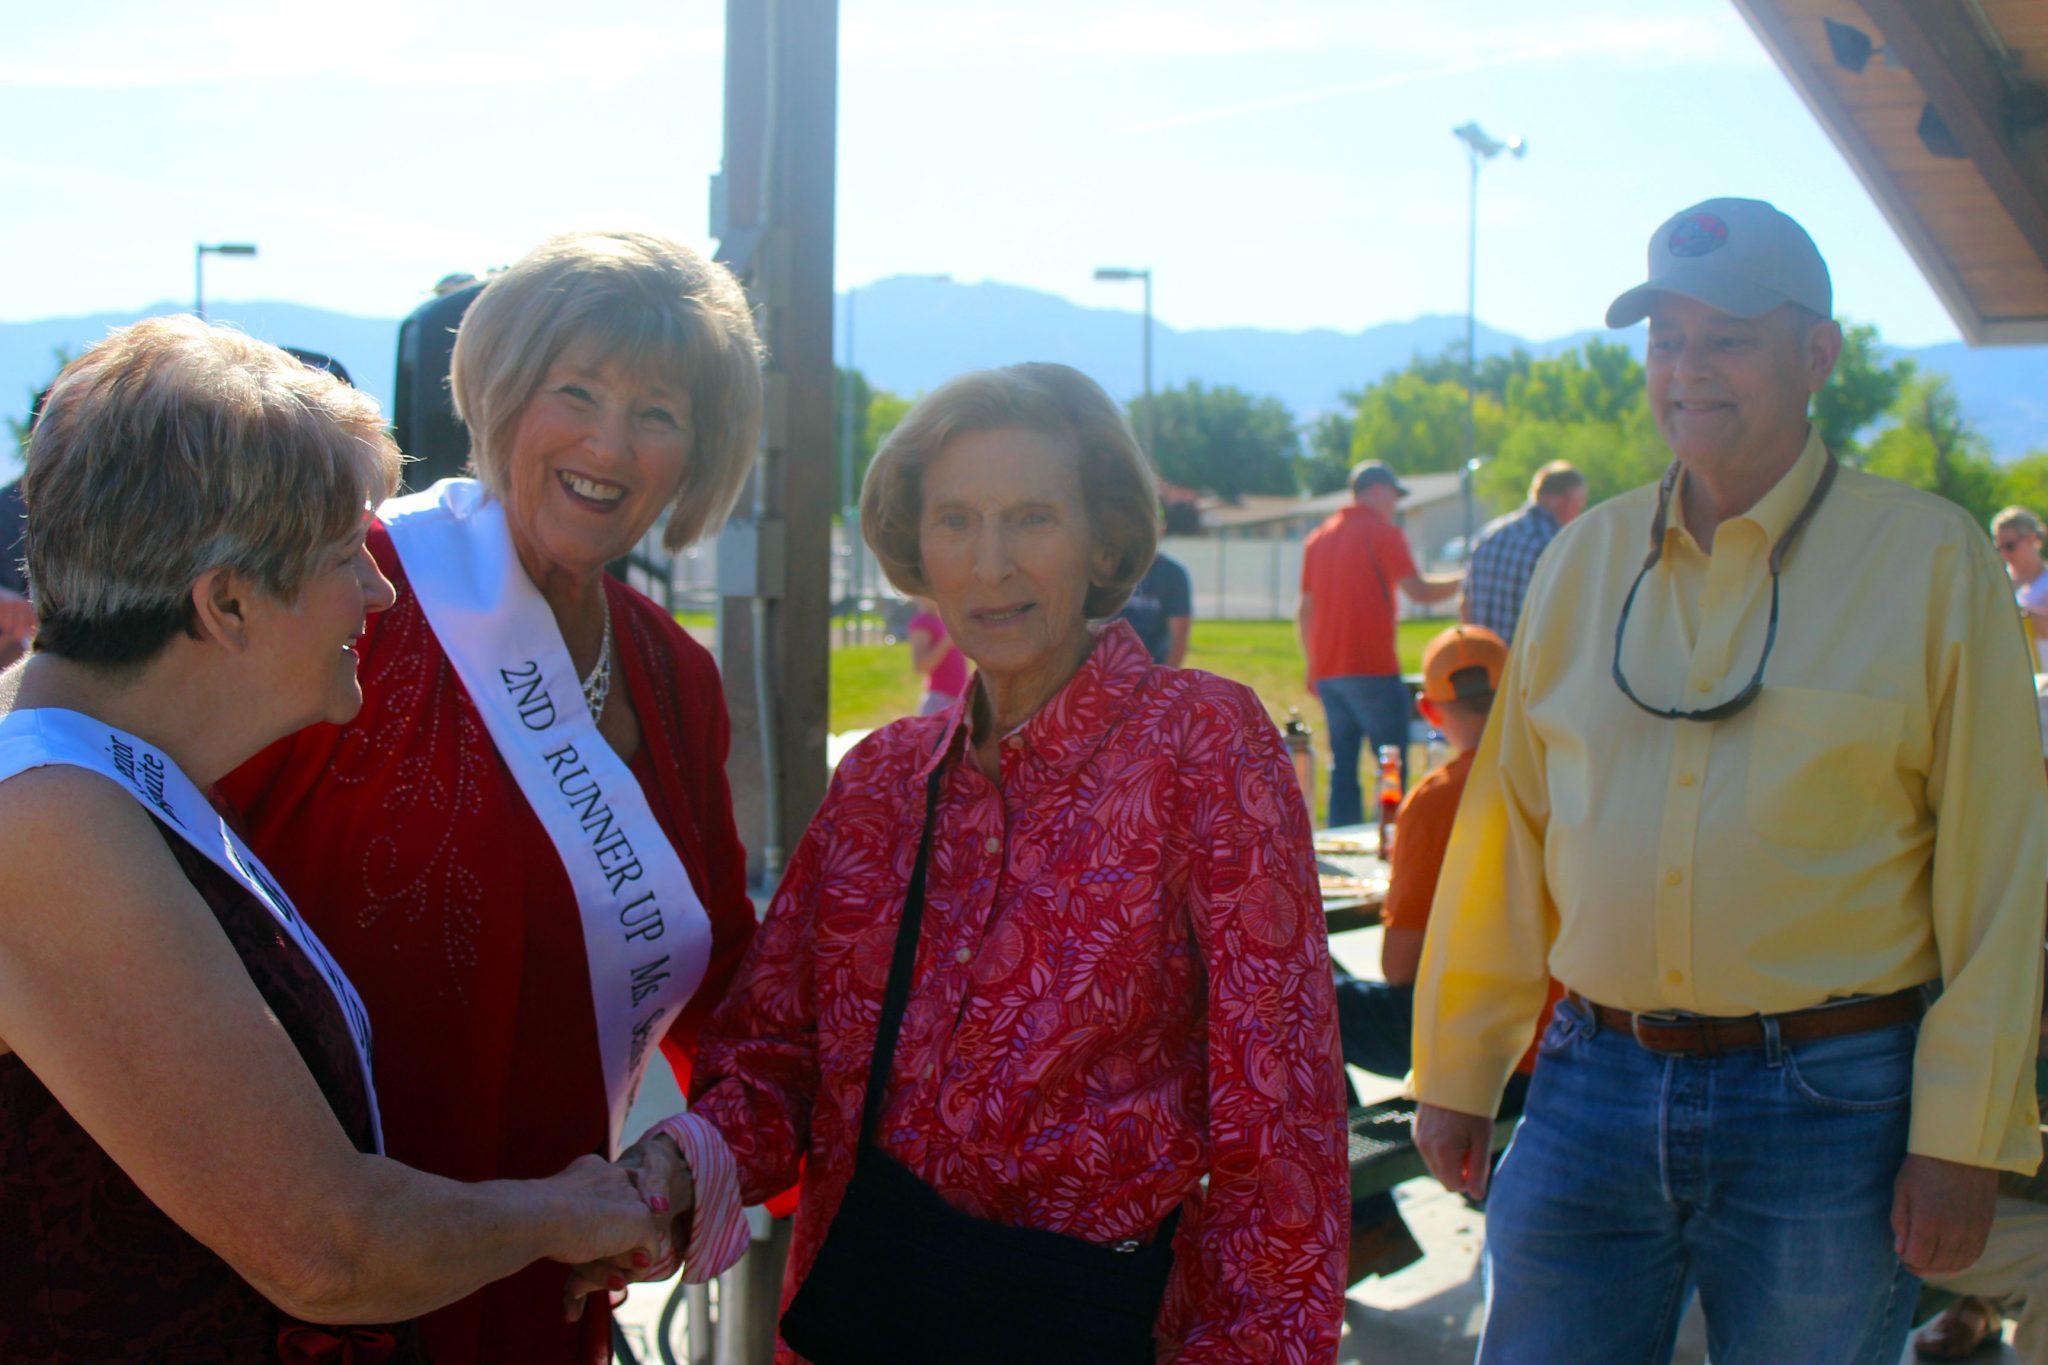 Mesquite Days' Mayor's Pancake Breakfast and Parade